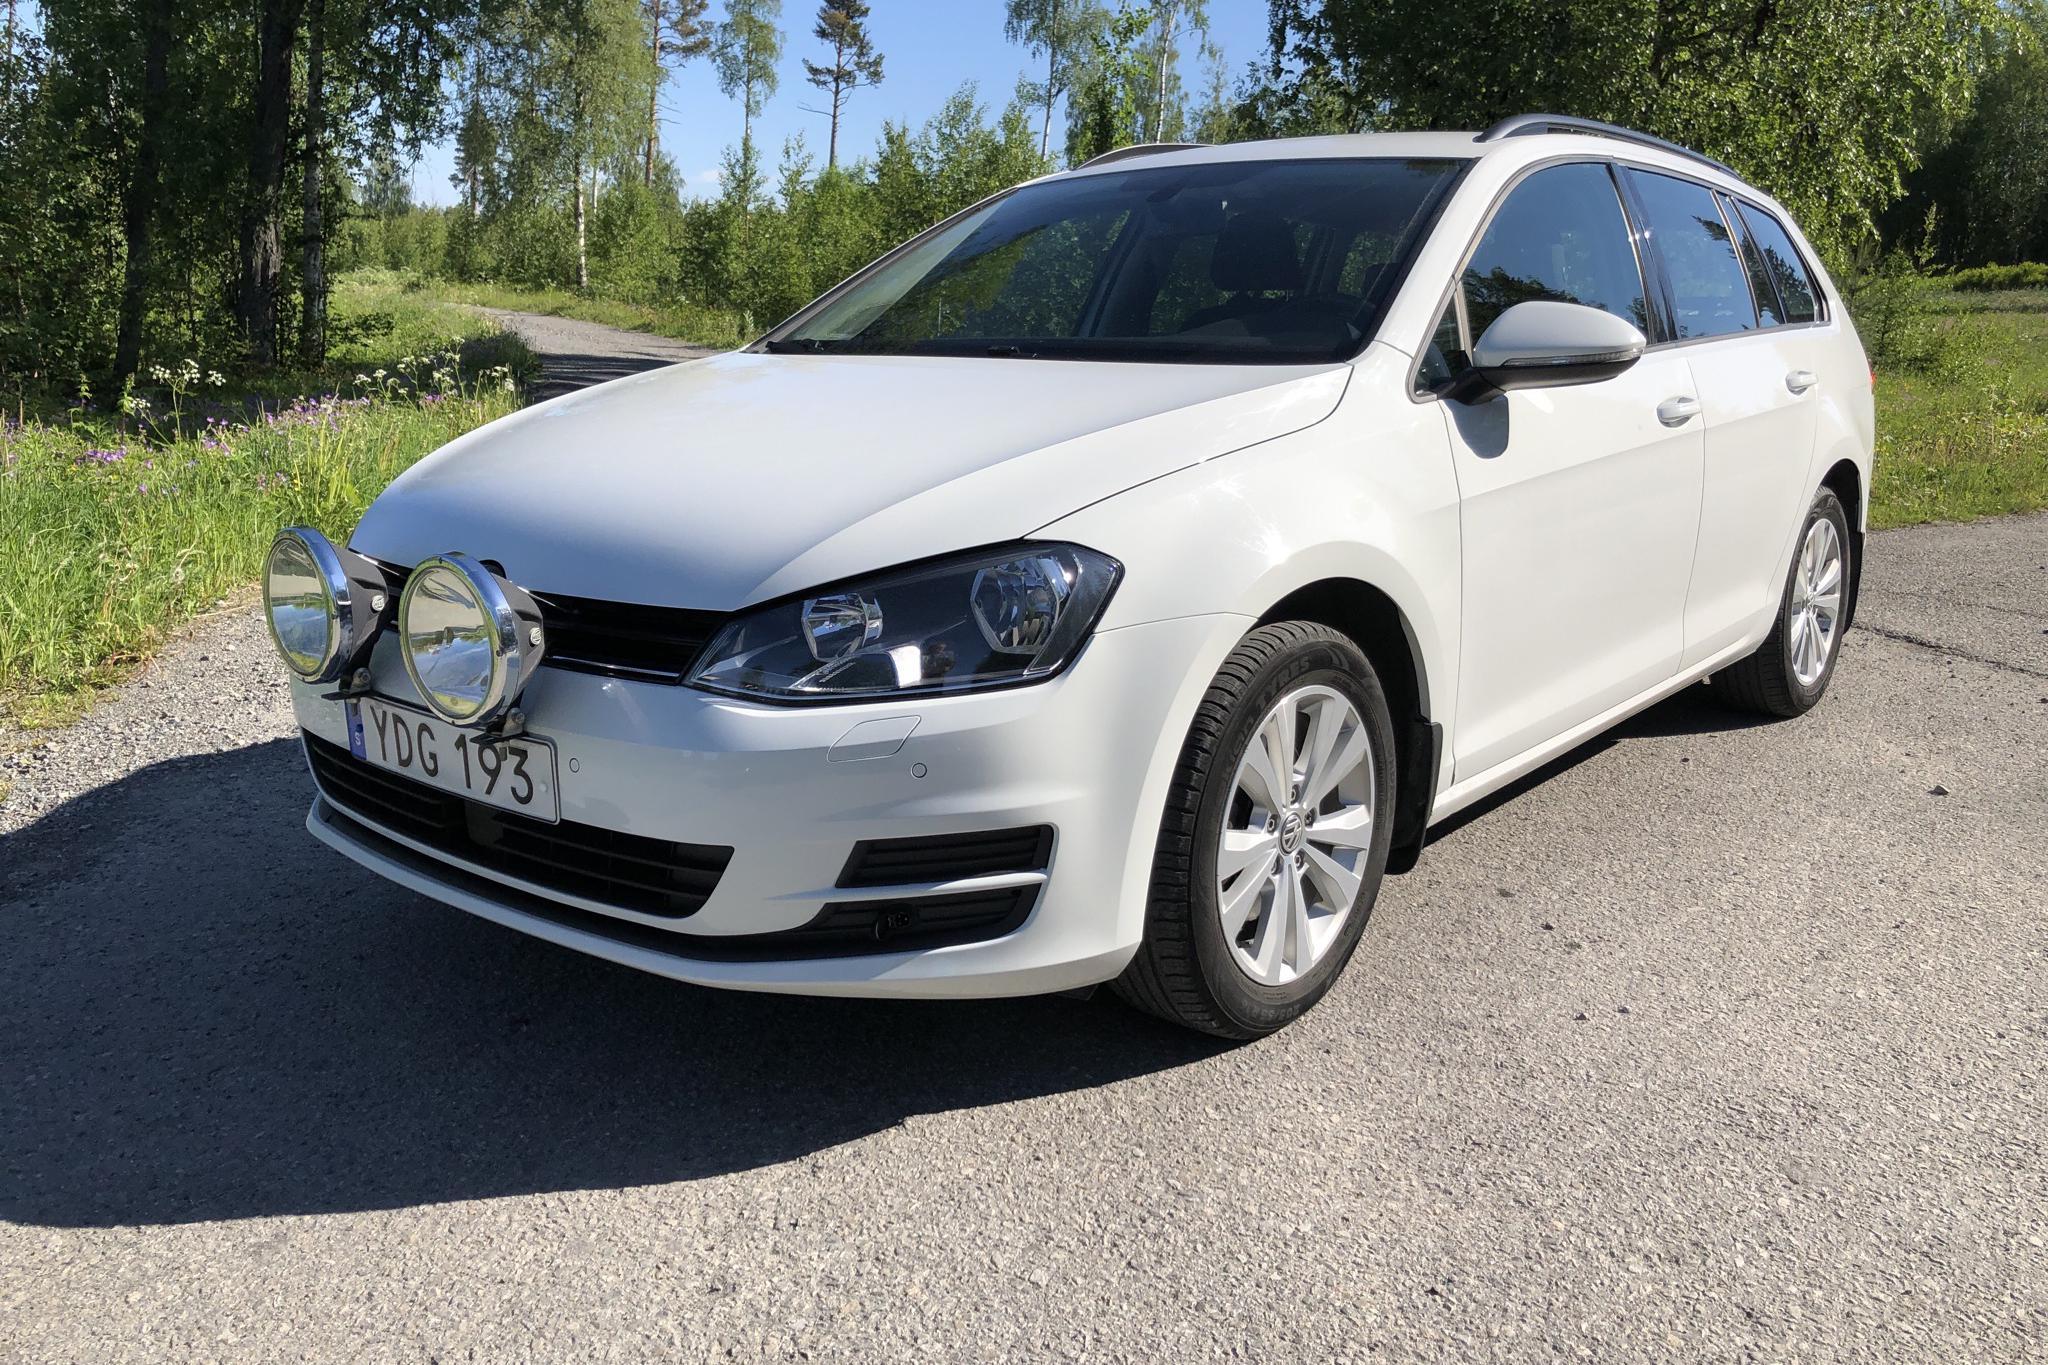 VW Golf VII 1.4 TSI Multifuel Sportscombi (125hk)